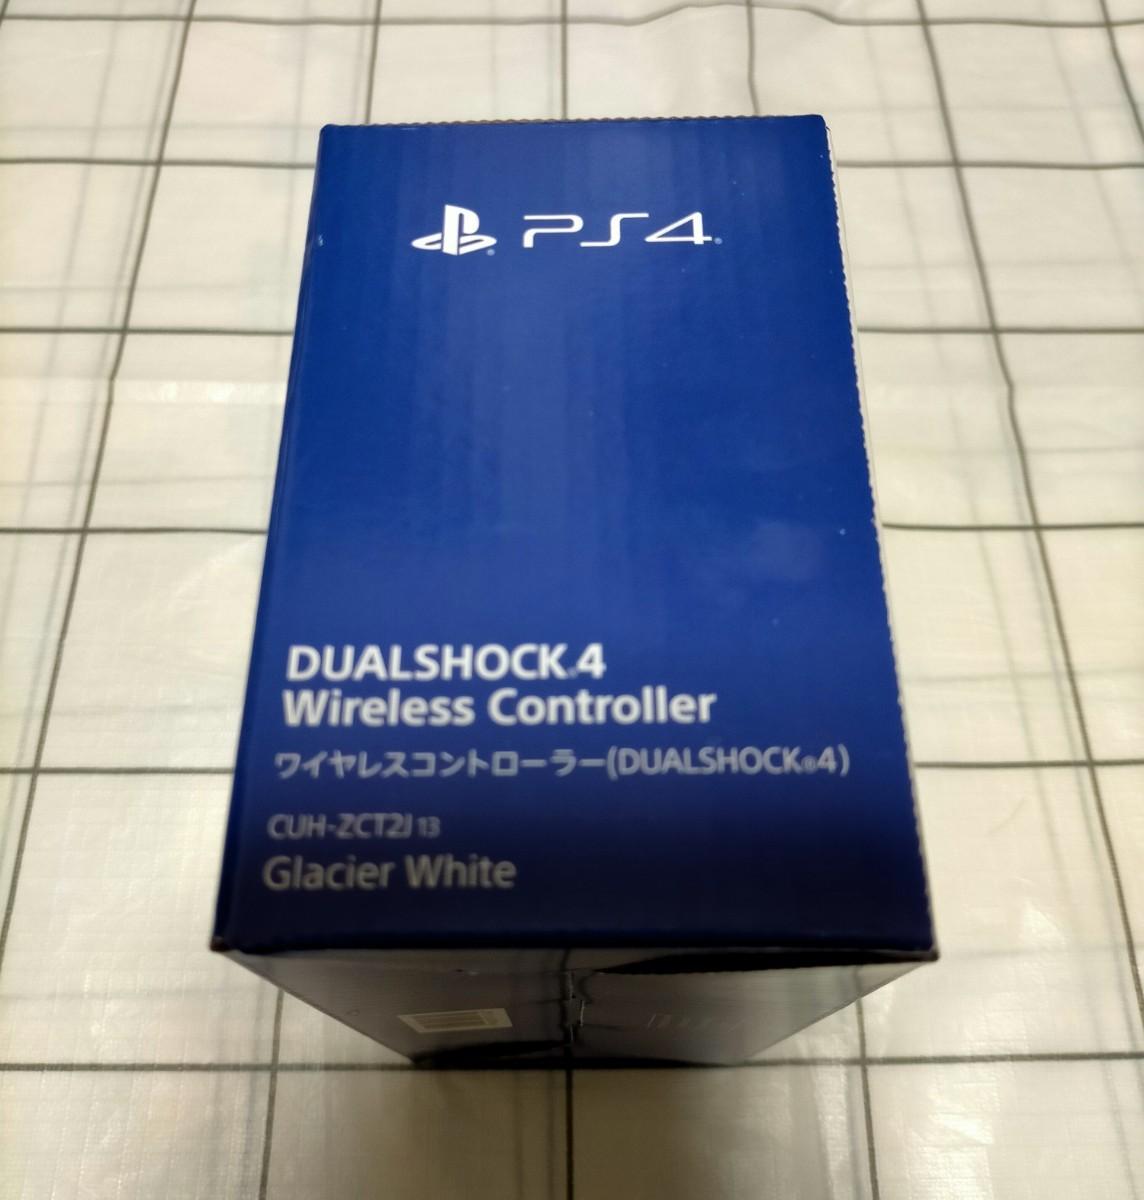 PS4 ワイヤレスコントローラーDUALSHOCK4